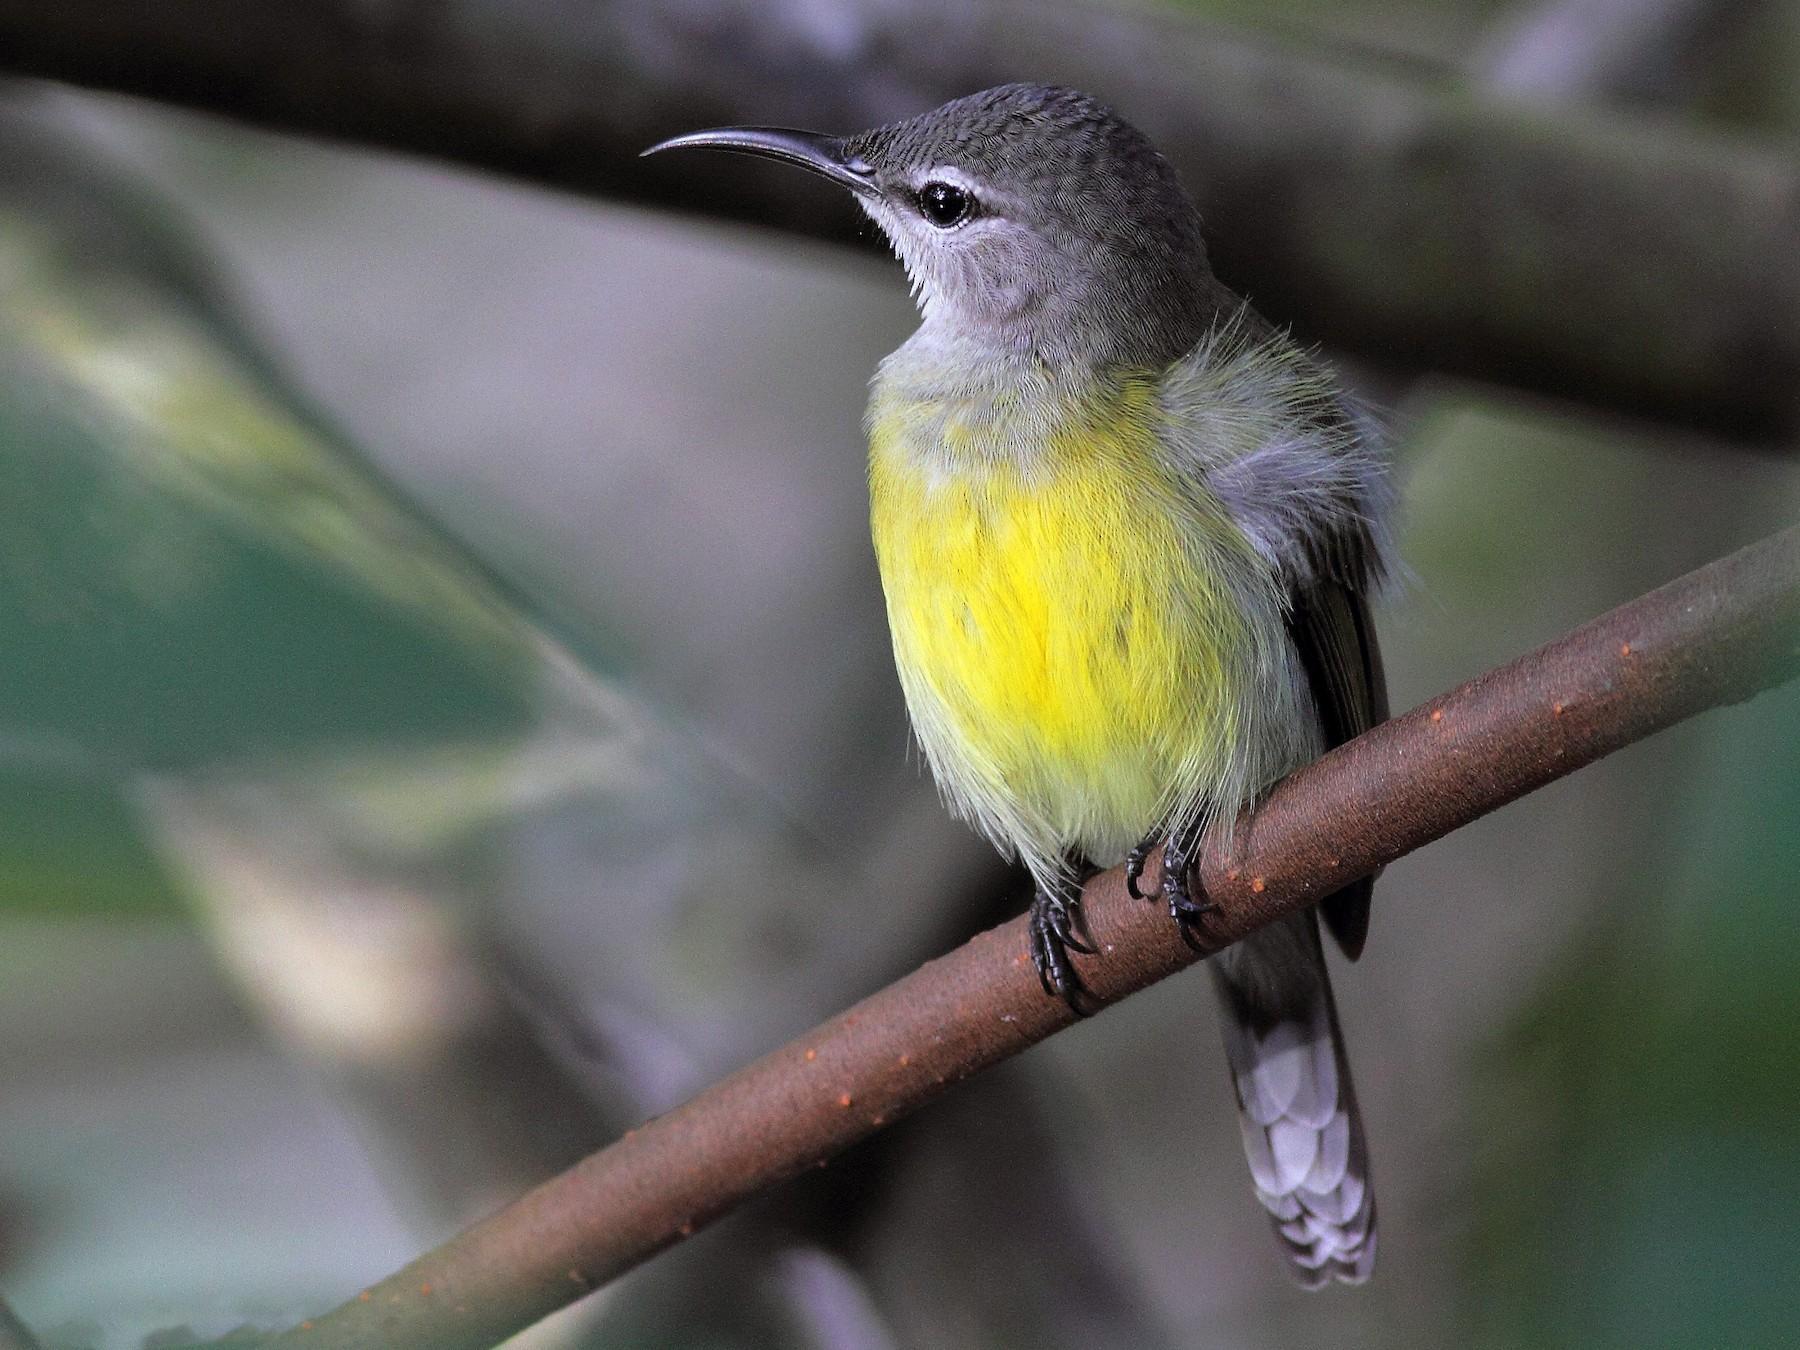 Copper-throated Sunbird - Fran Trabalon